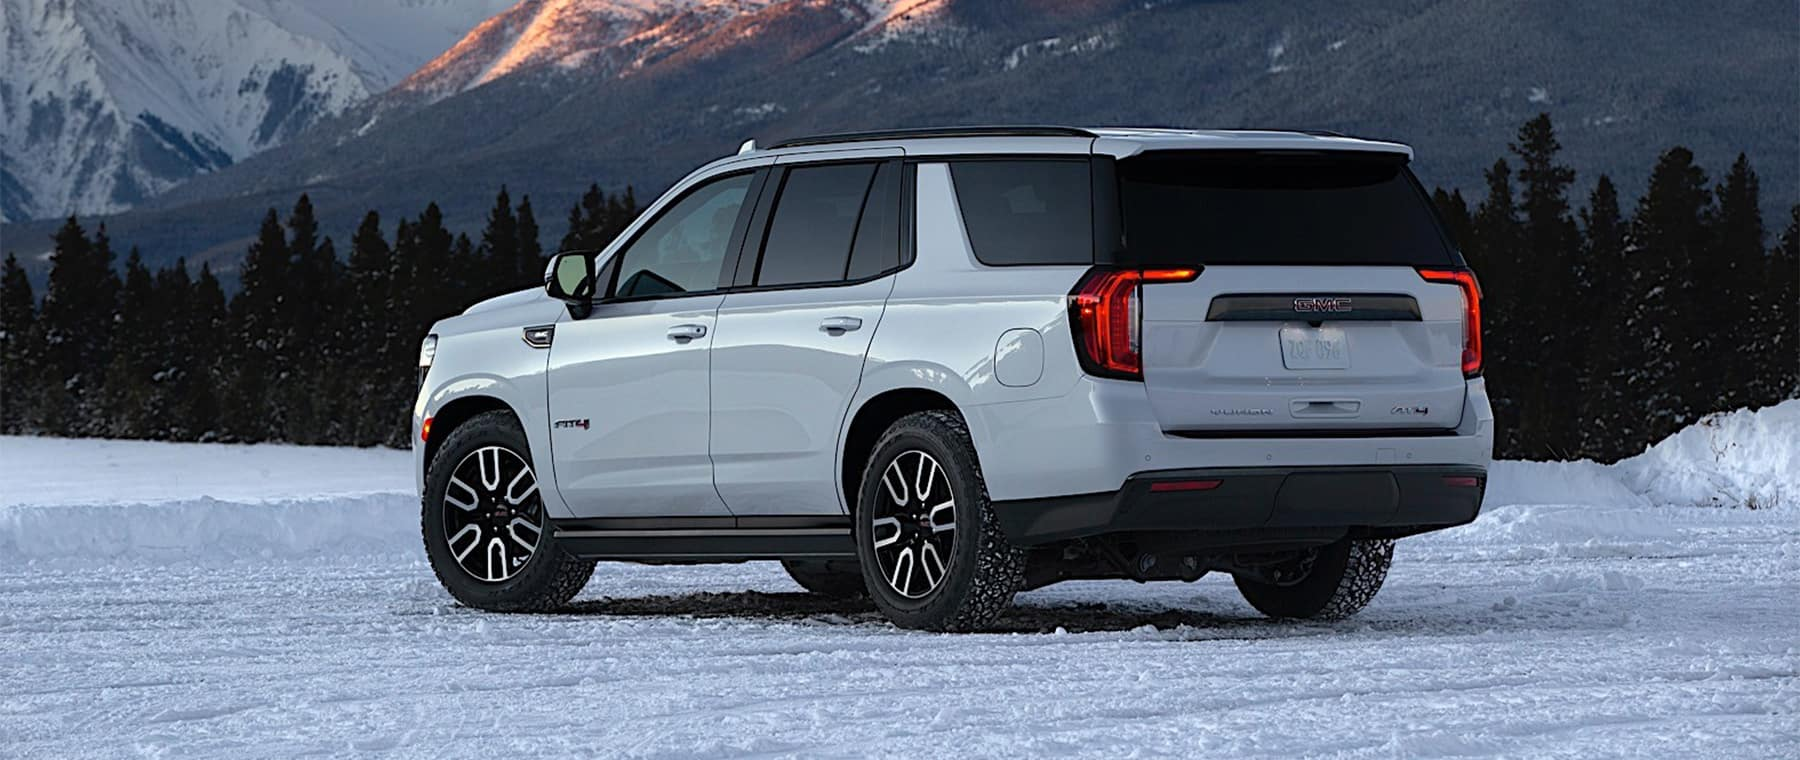 2021 GMC Yukon white 3/4 angle rear view